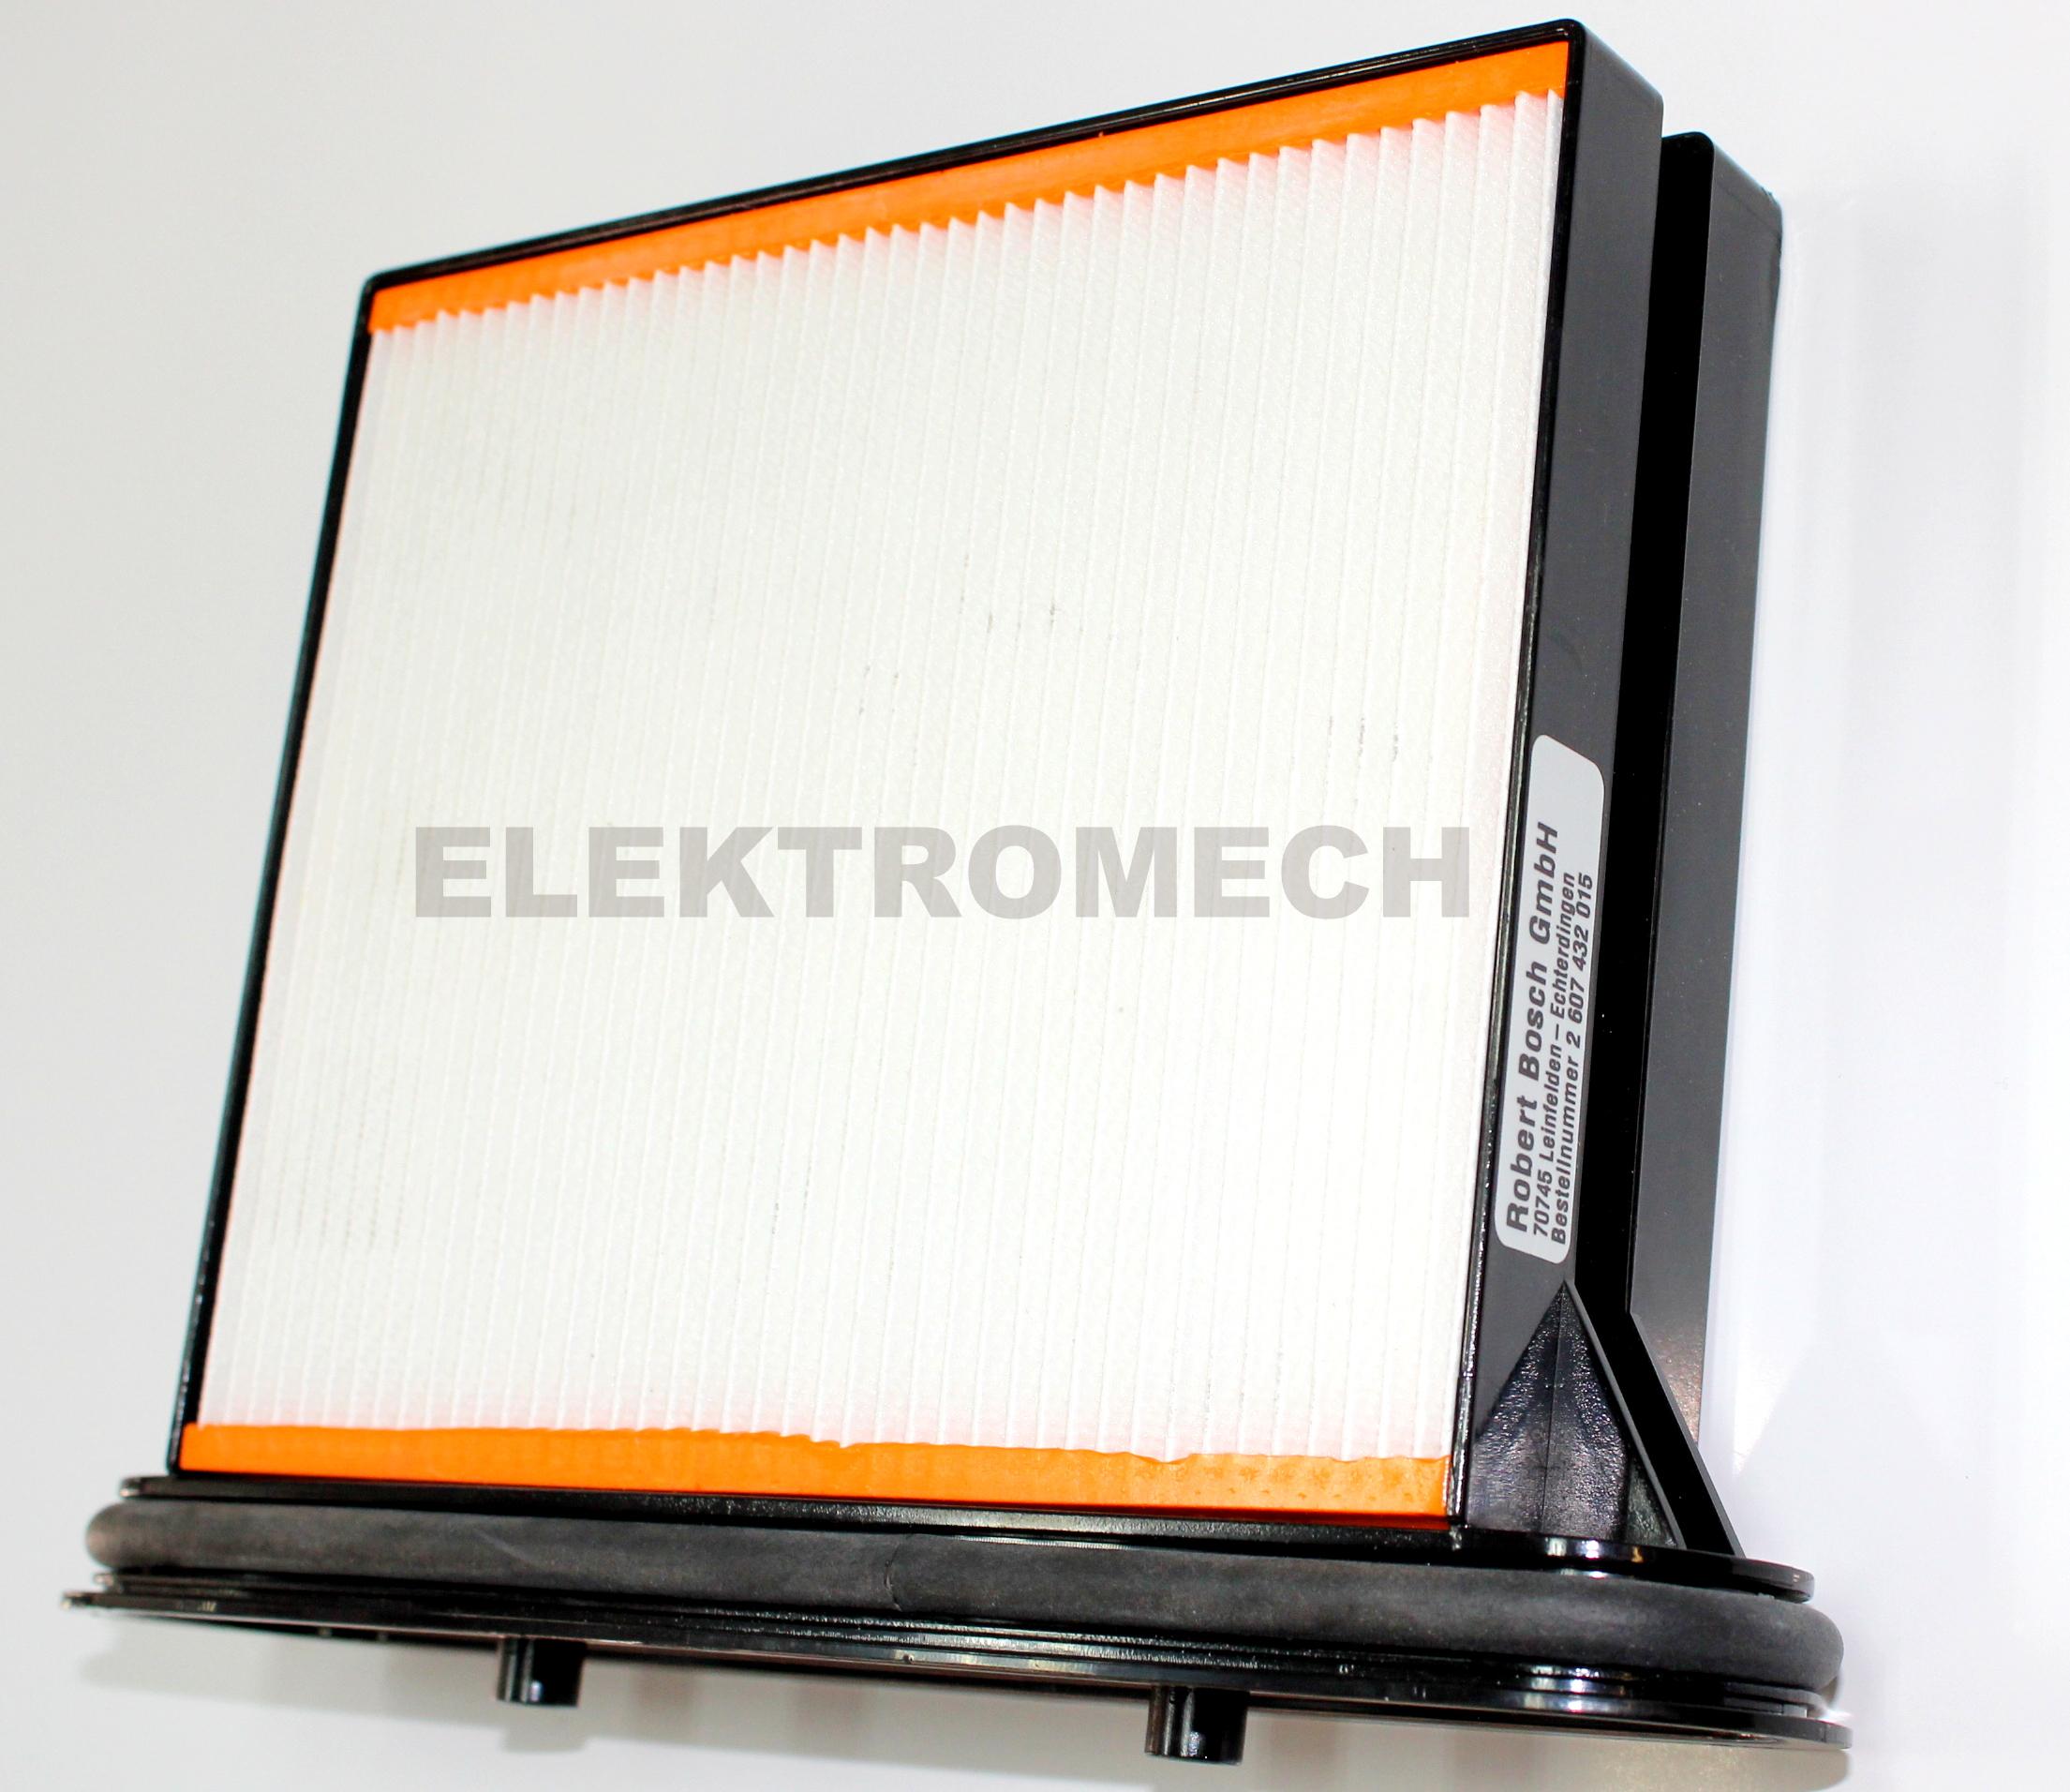 bosch filtr sta y gas 25 50 metabo starmix hitachi starmix elektromech. Black Bedroom Furniture Sets. Home Design Ideas